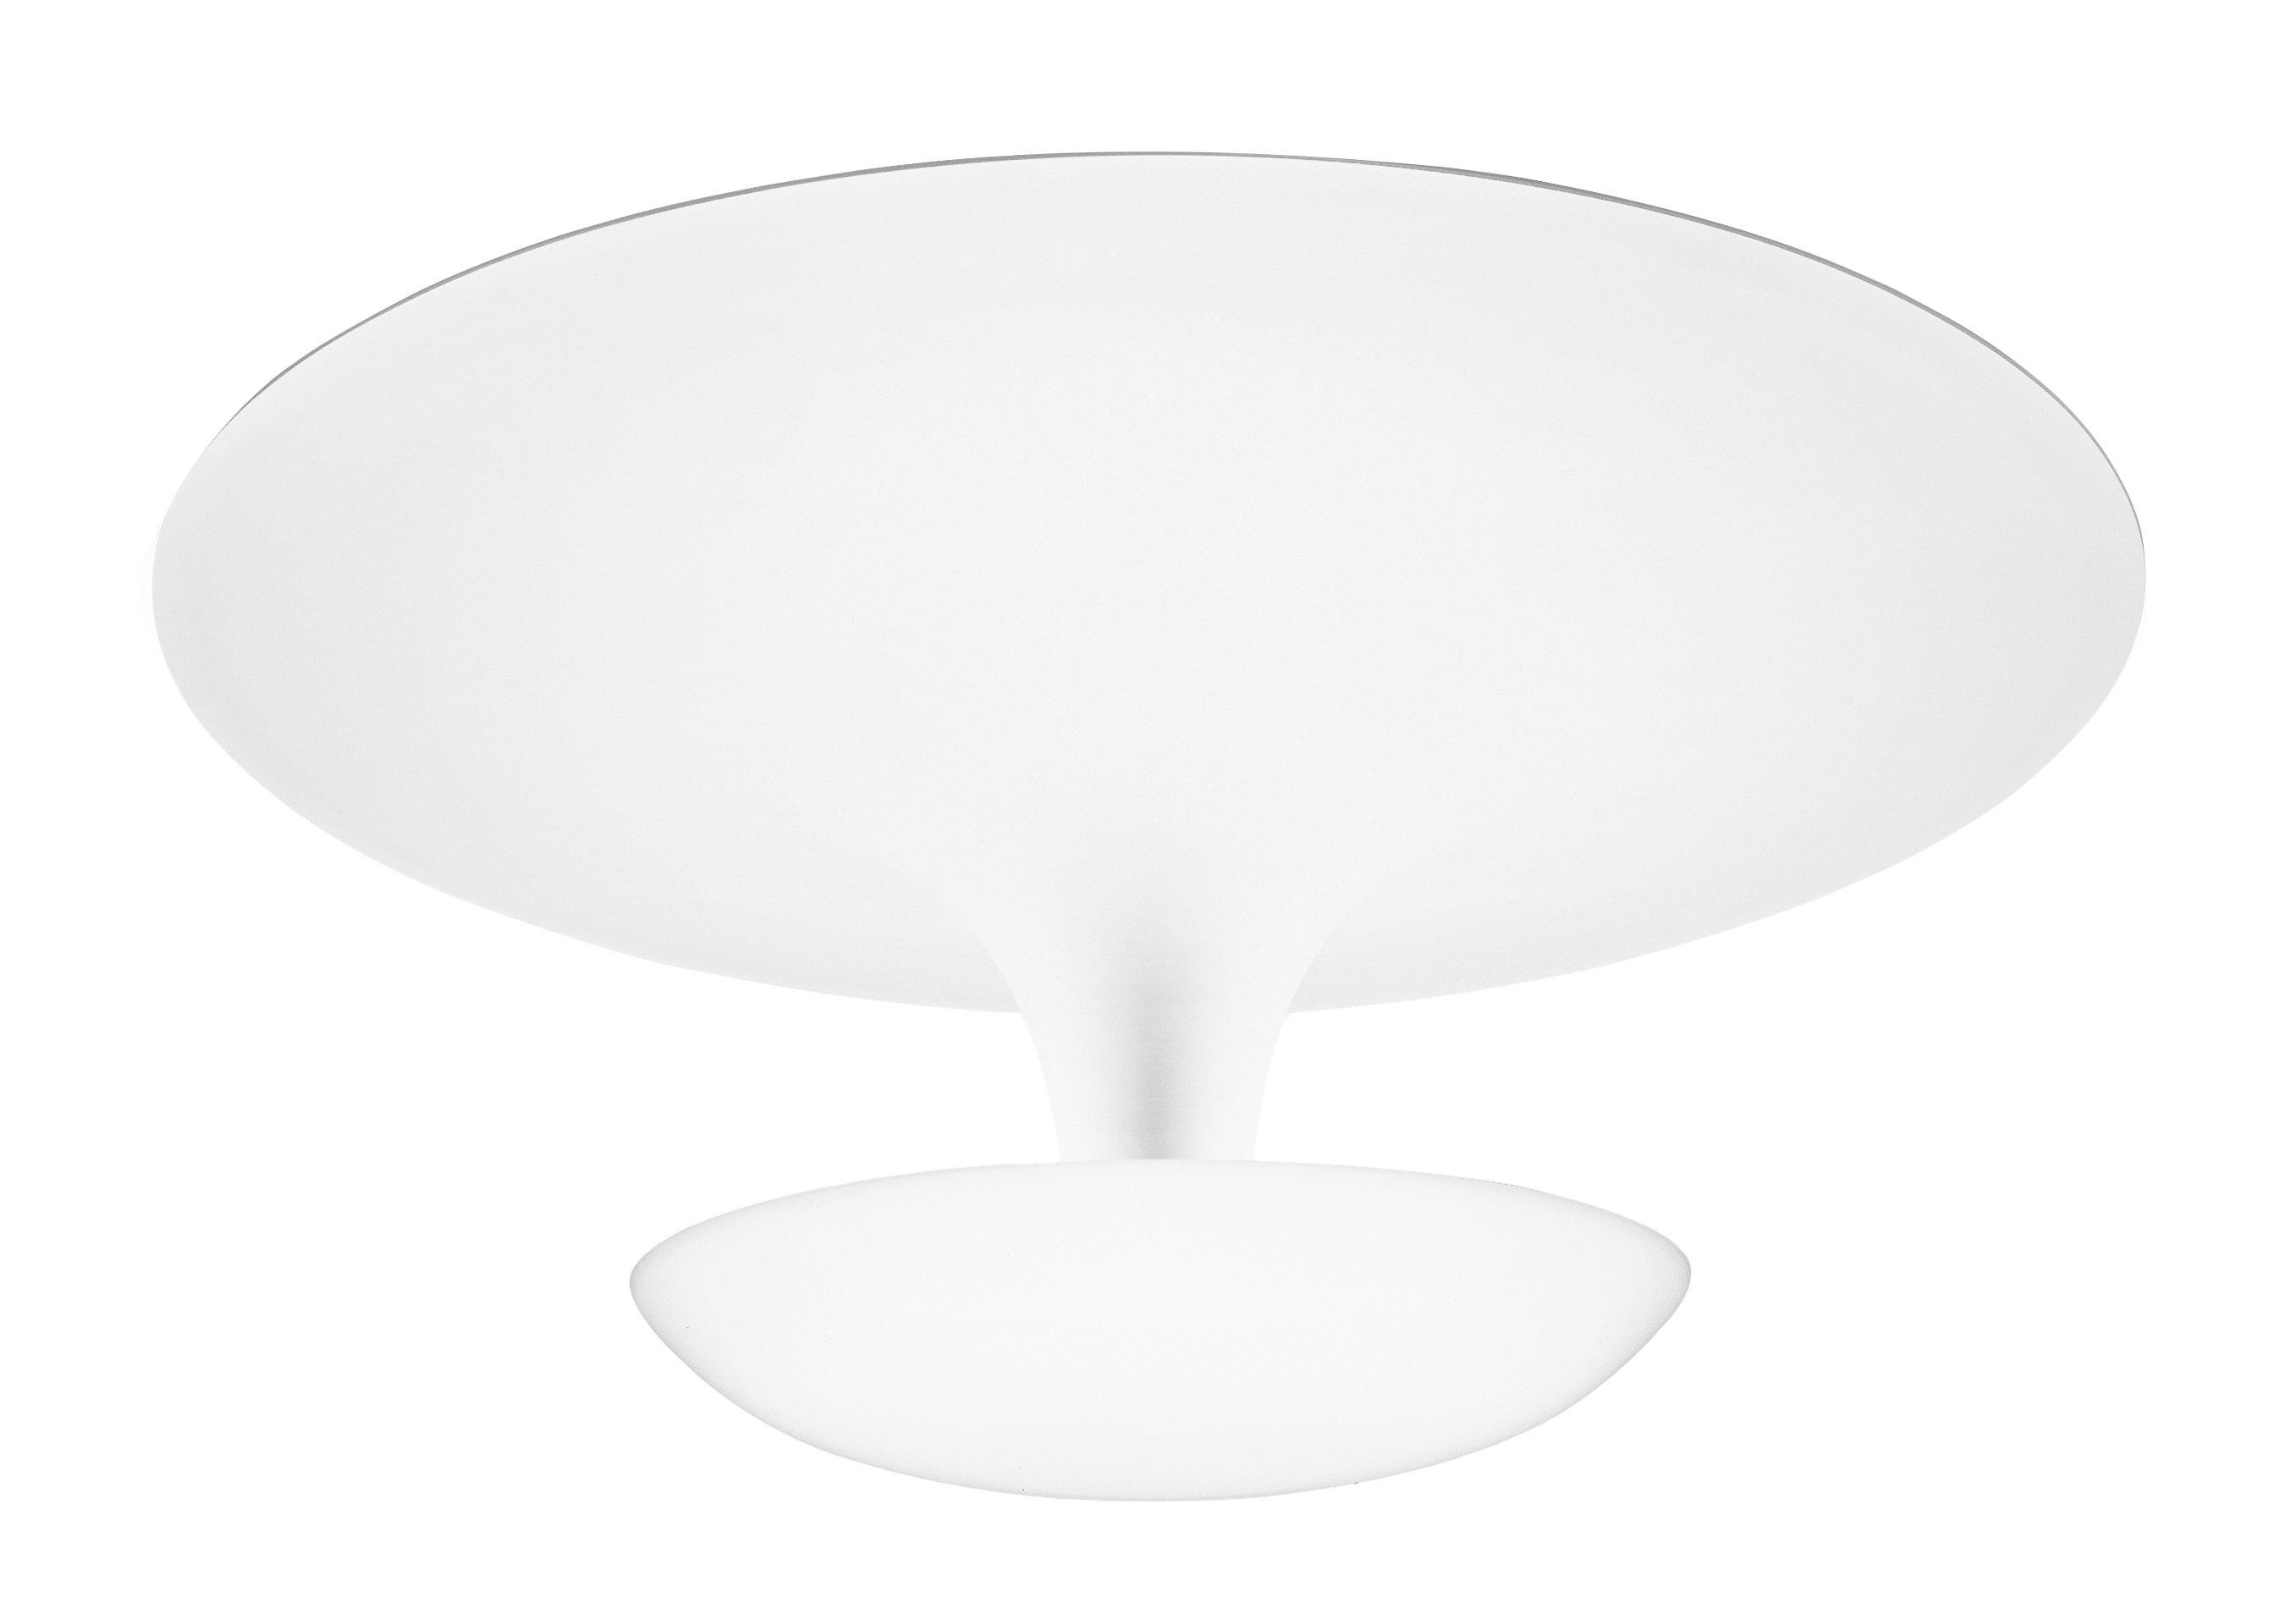 Luminaire - Plafonniers - Plafonnier Funnel / Ø 35 cm - Vibia - Ø 35 cm / Blanc - Aluminium peint